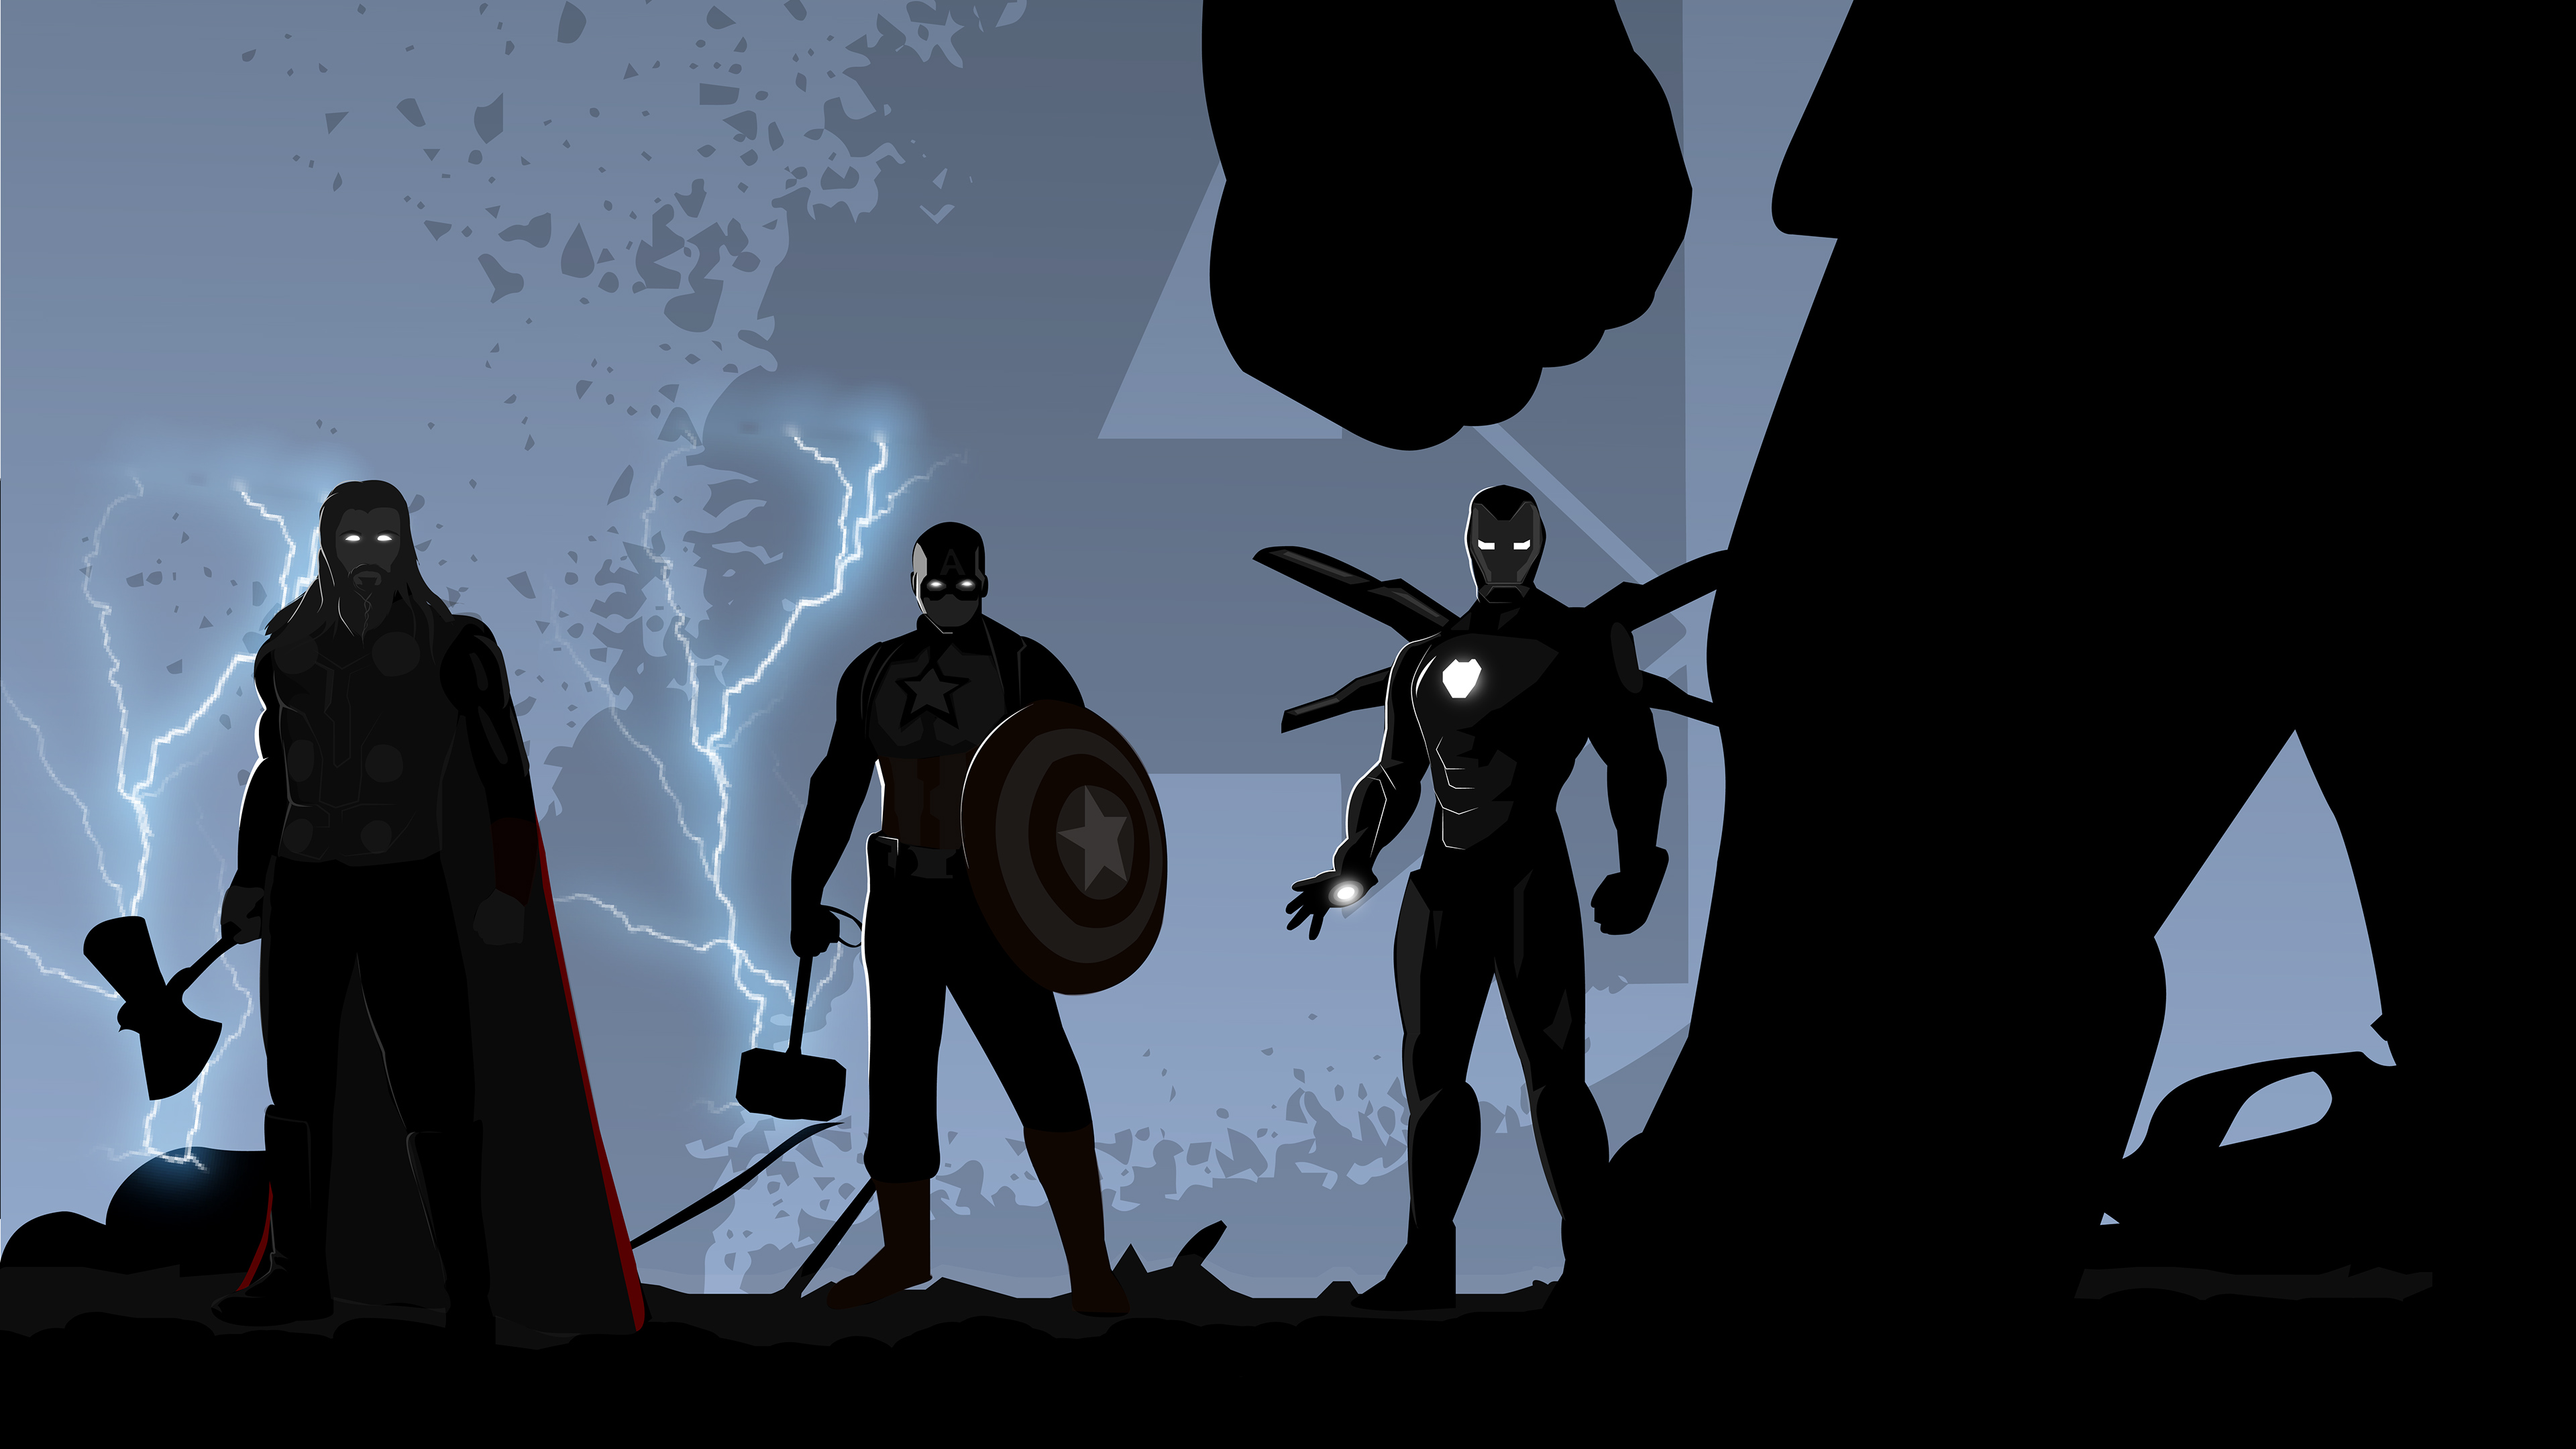 Avengers Endgame Minimal Illustration Hd Superheroes 4k